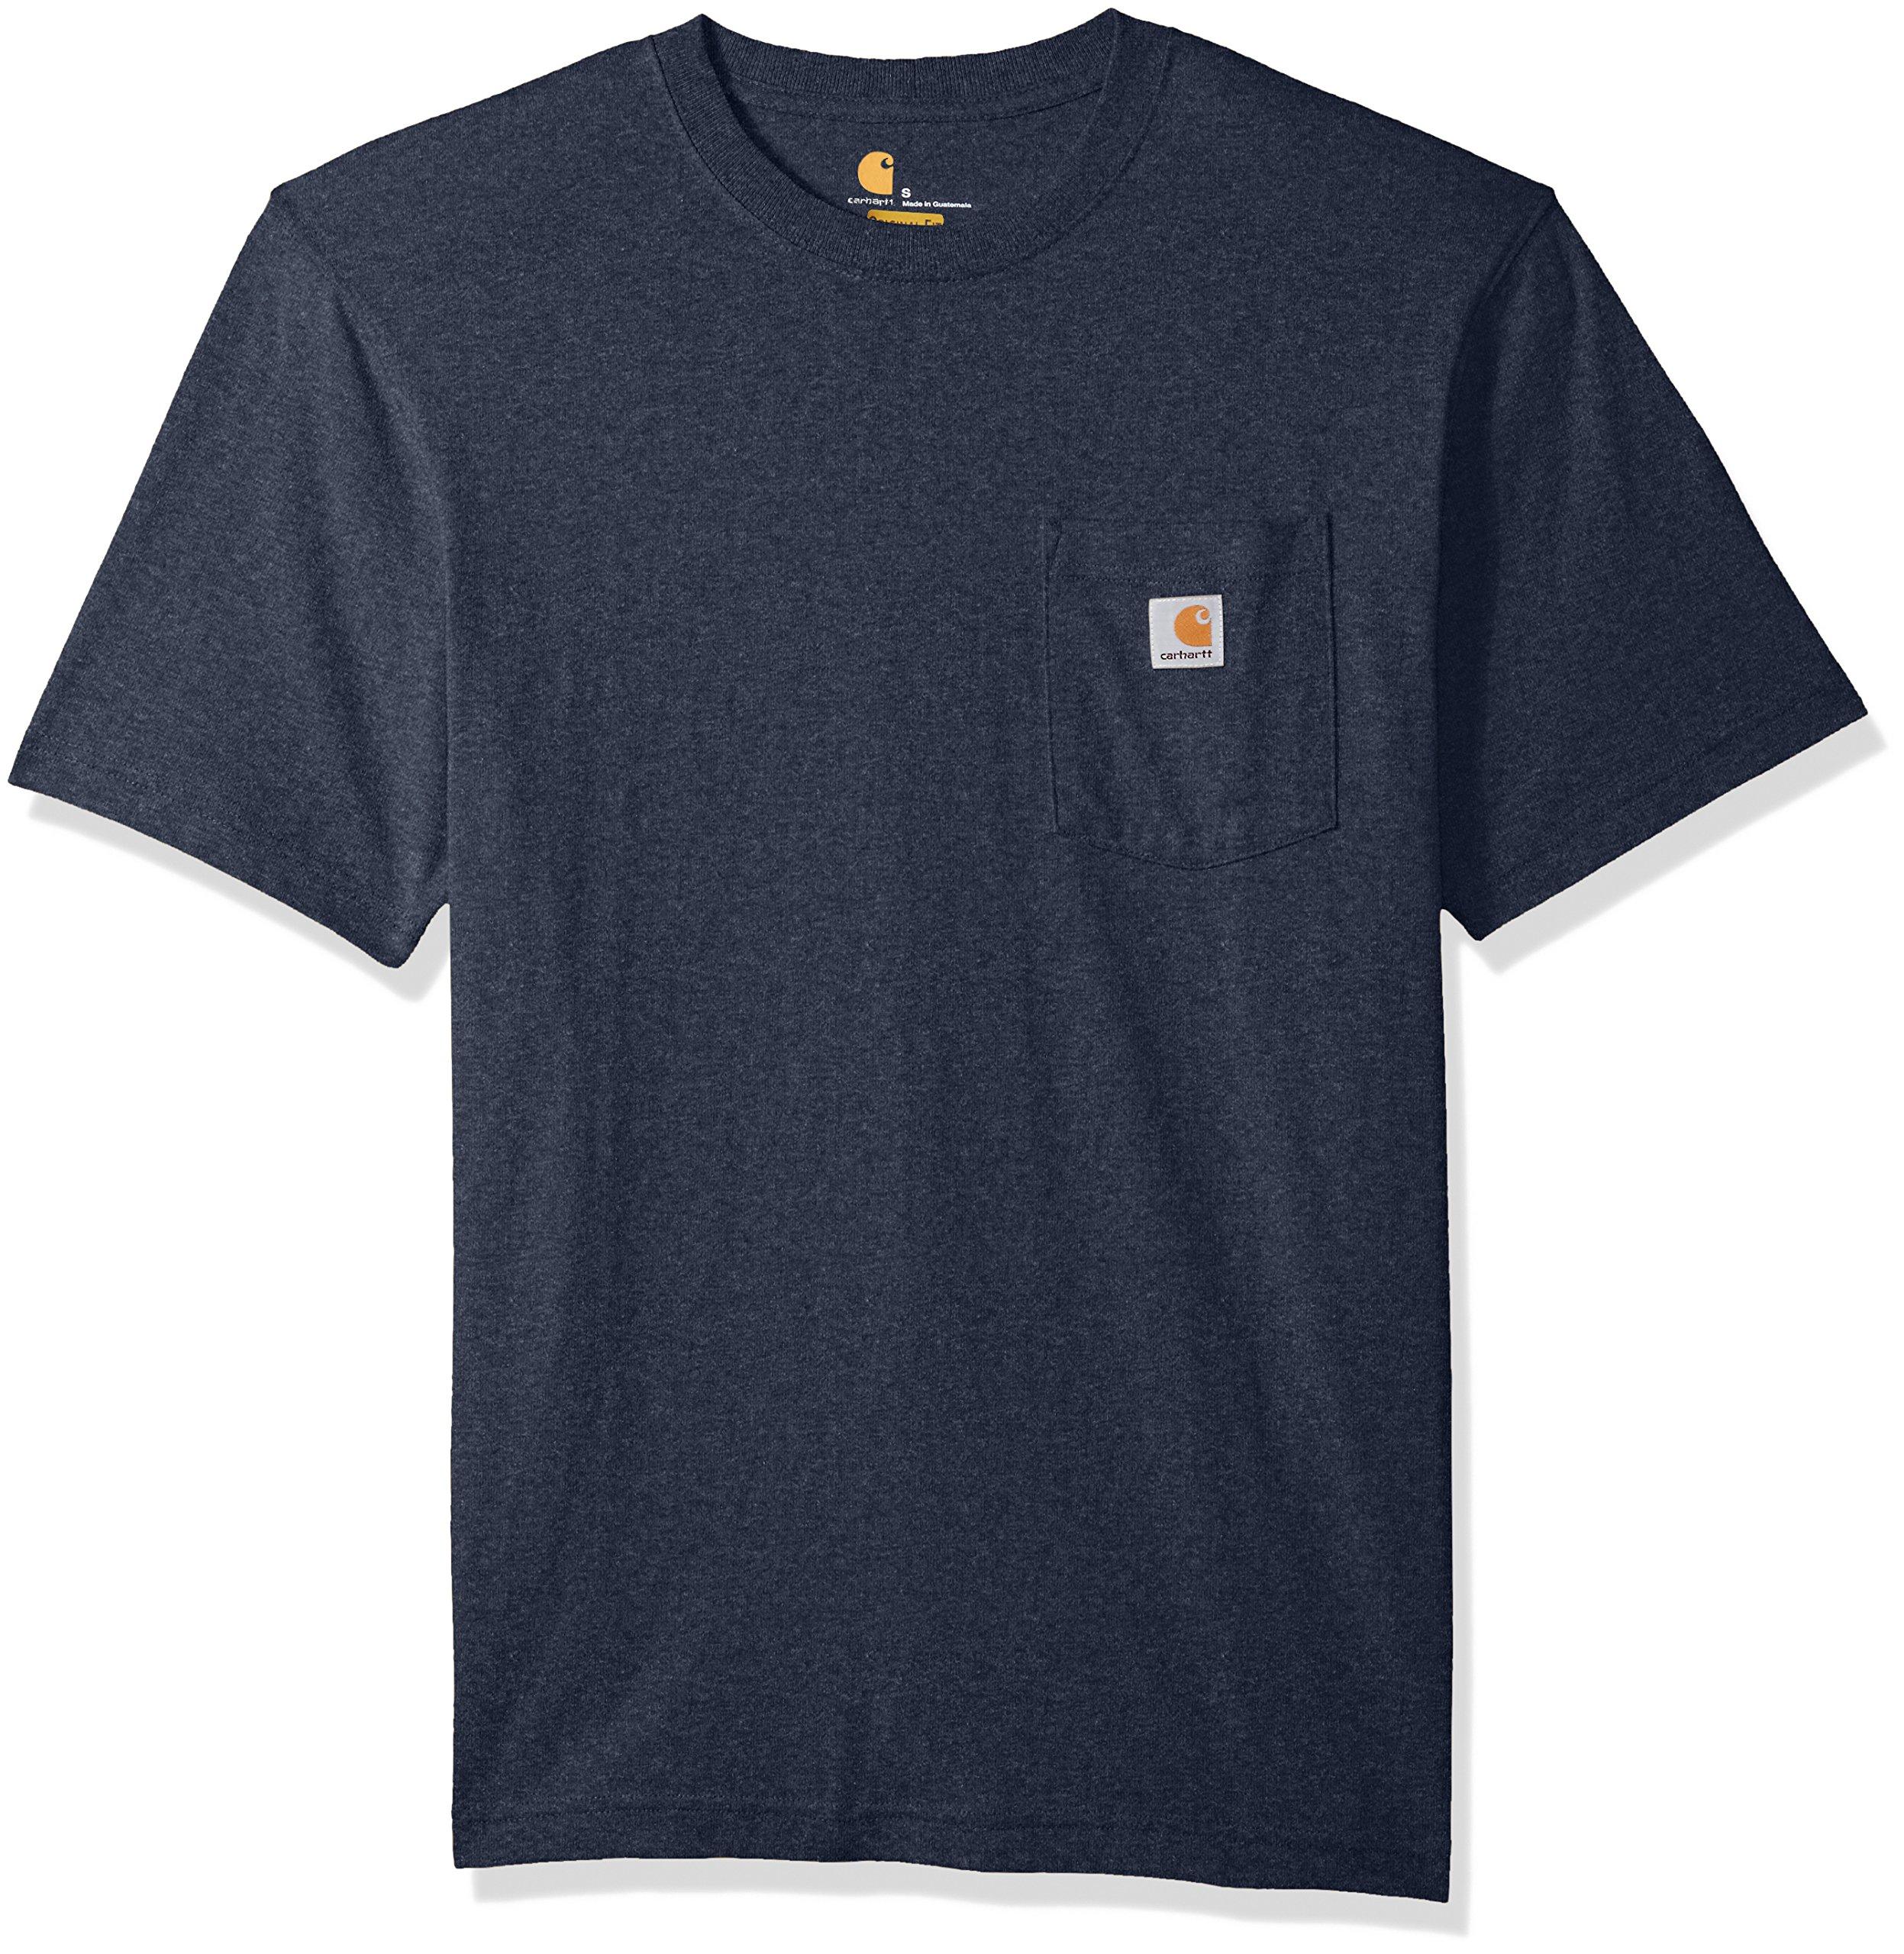 Carhartt Men's Workwear Short Sleeve T-Shirt in Original Fit K87, Navy Heather, X-Large